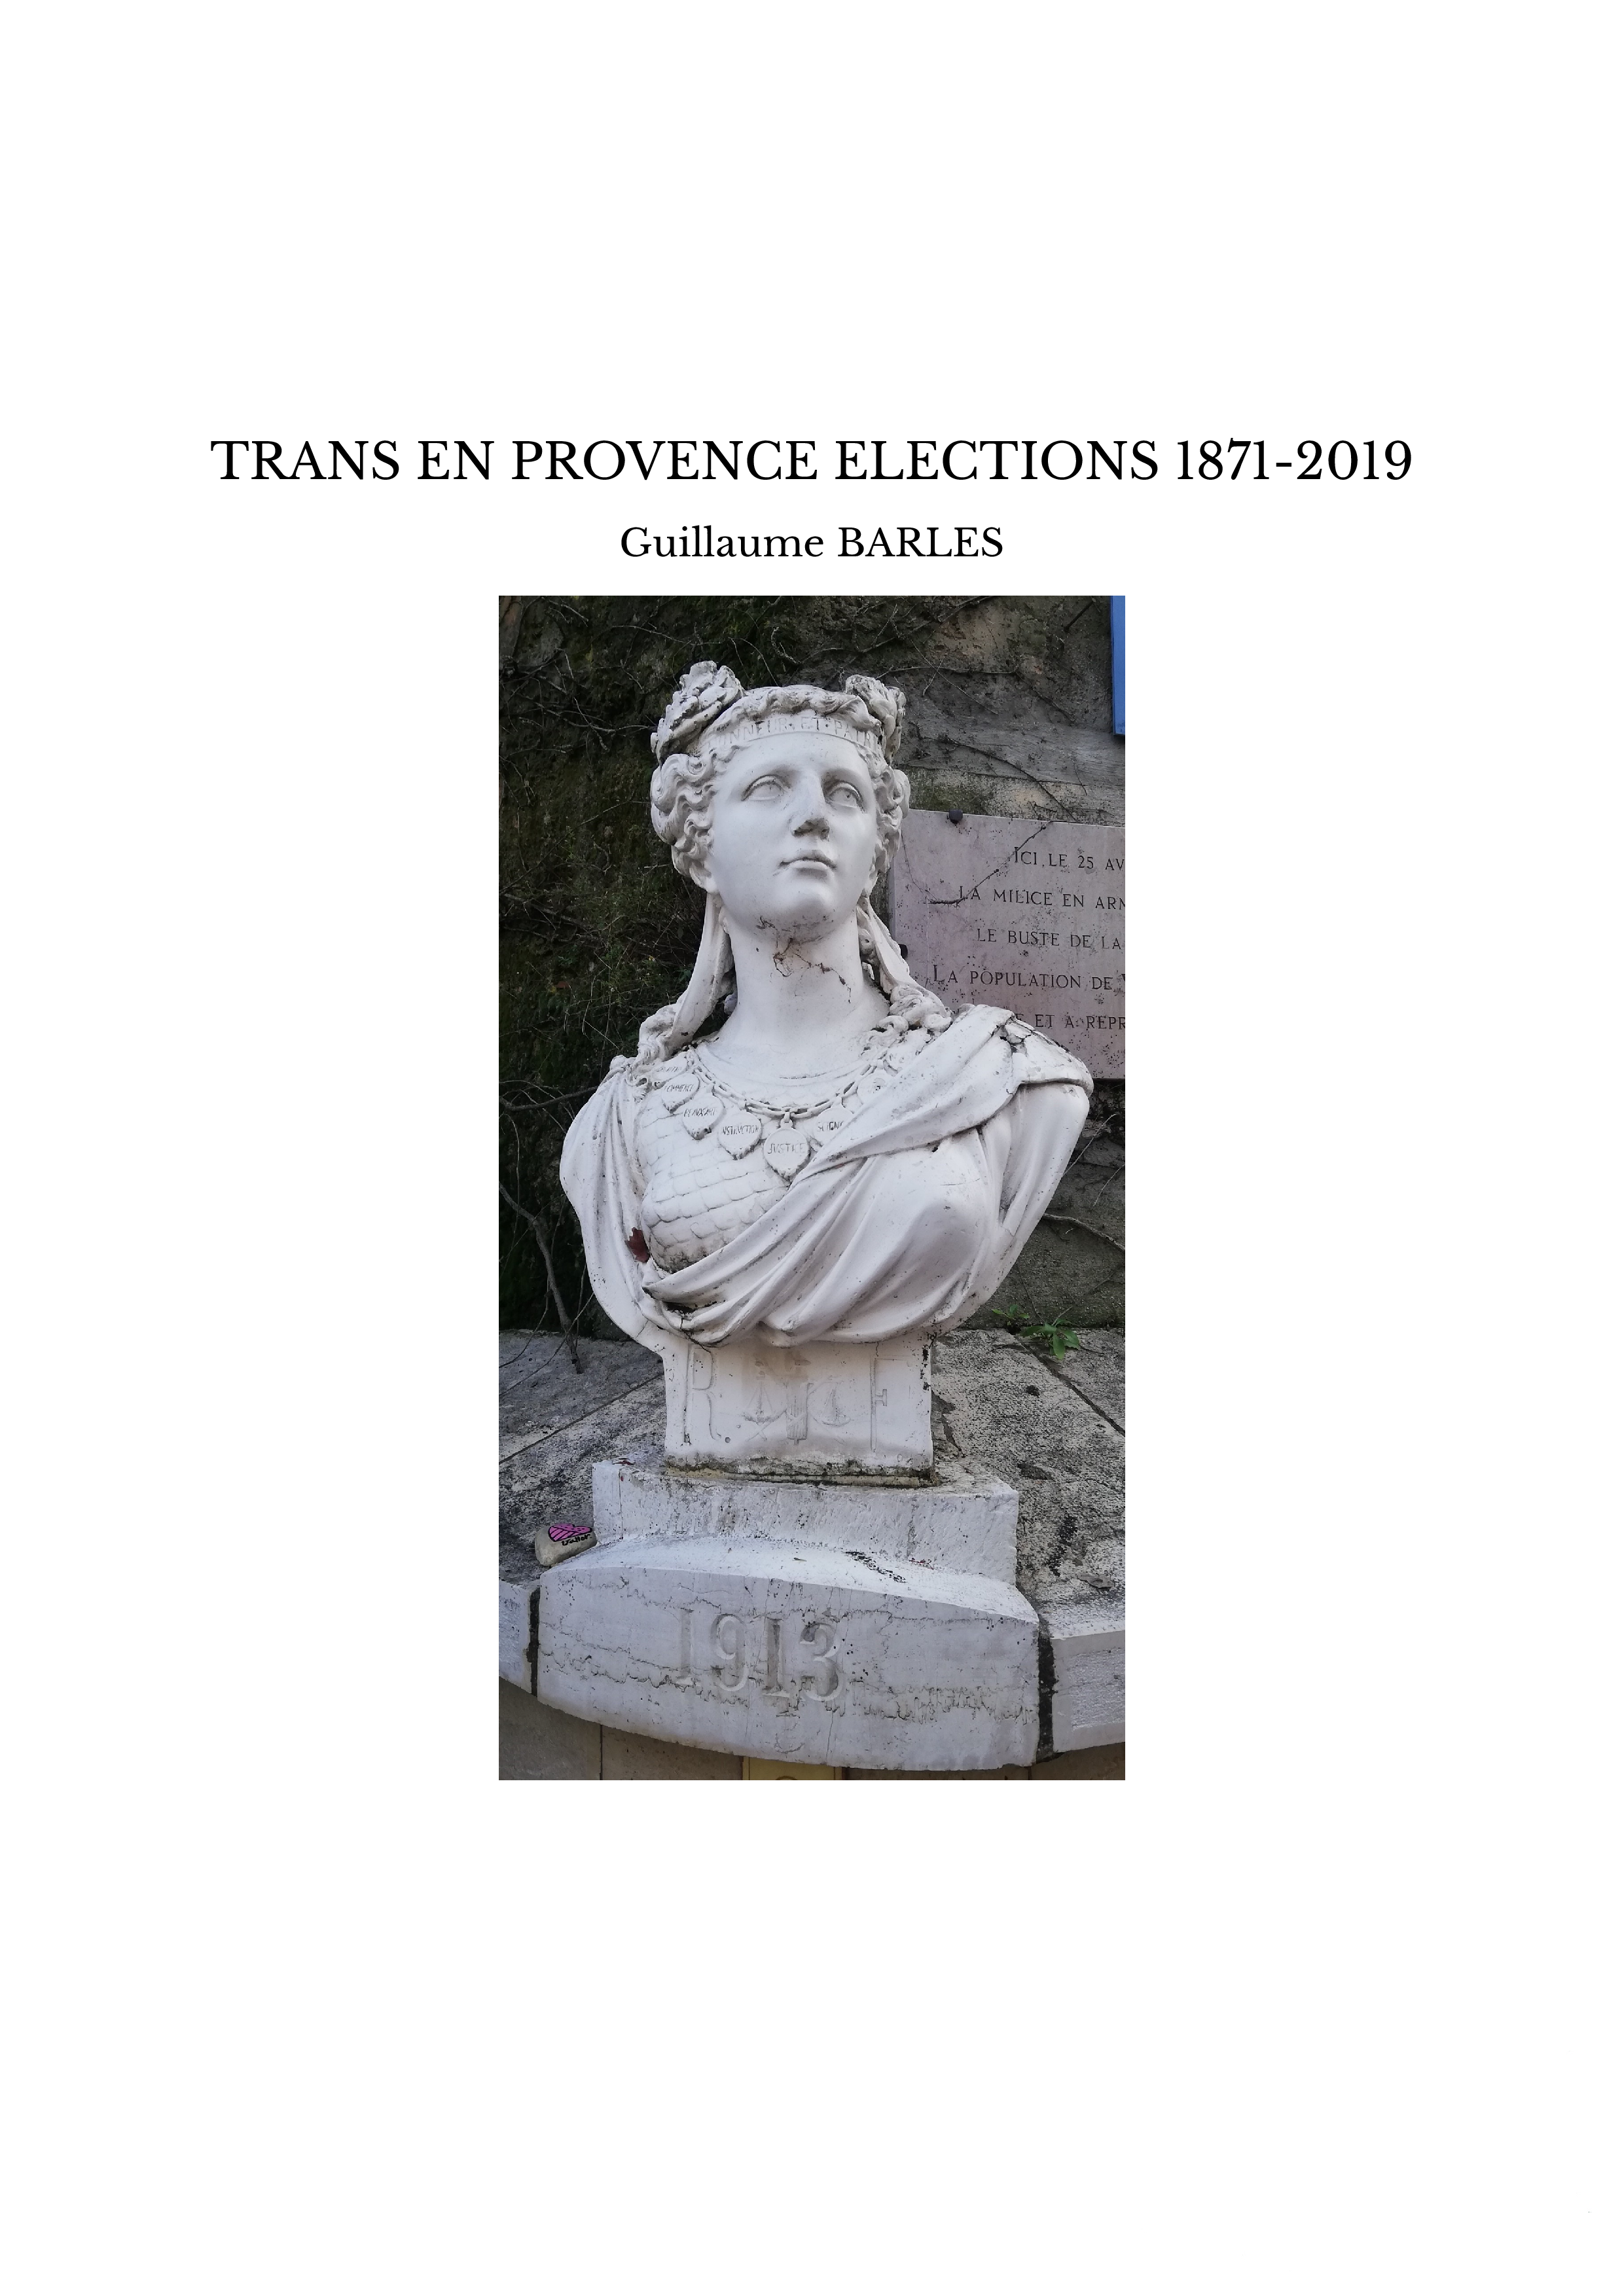 TRANS EN PROVENCE ELECTIONS 1871-2019